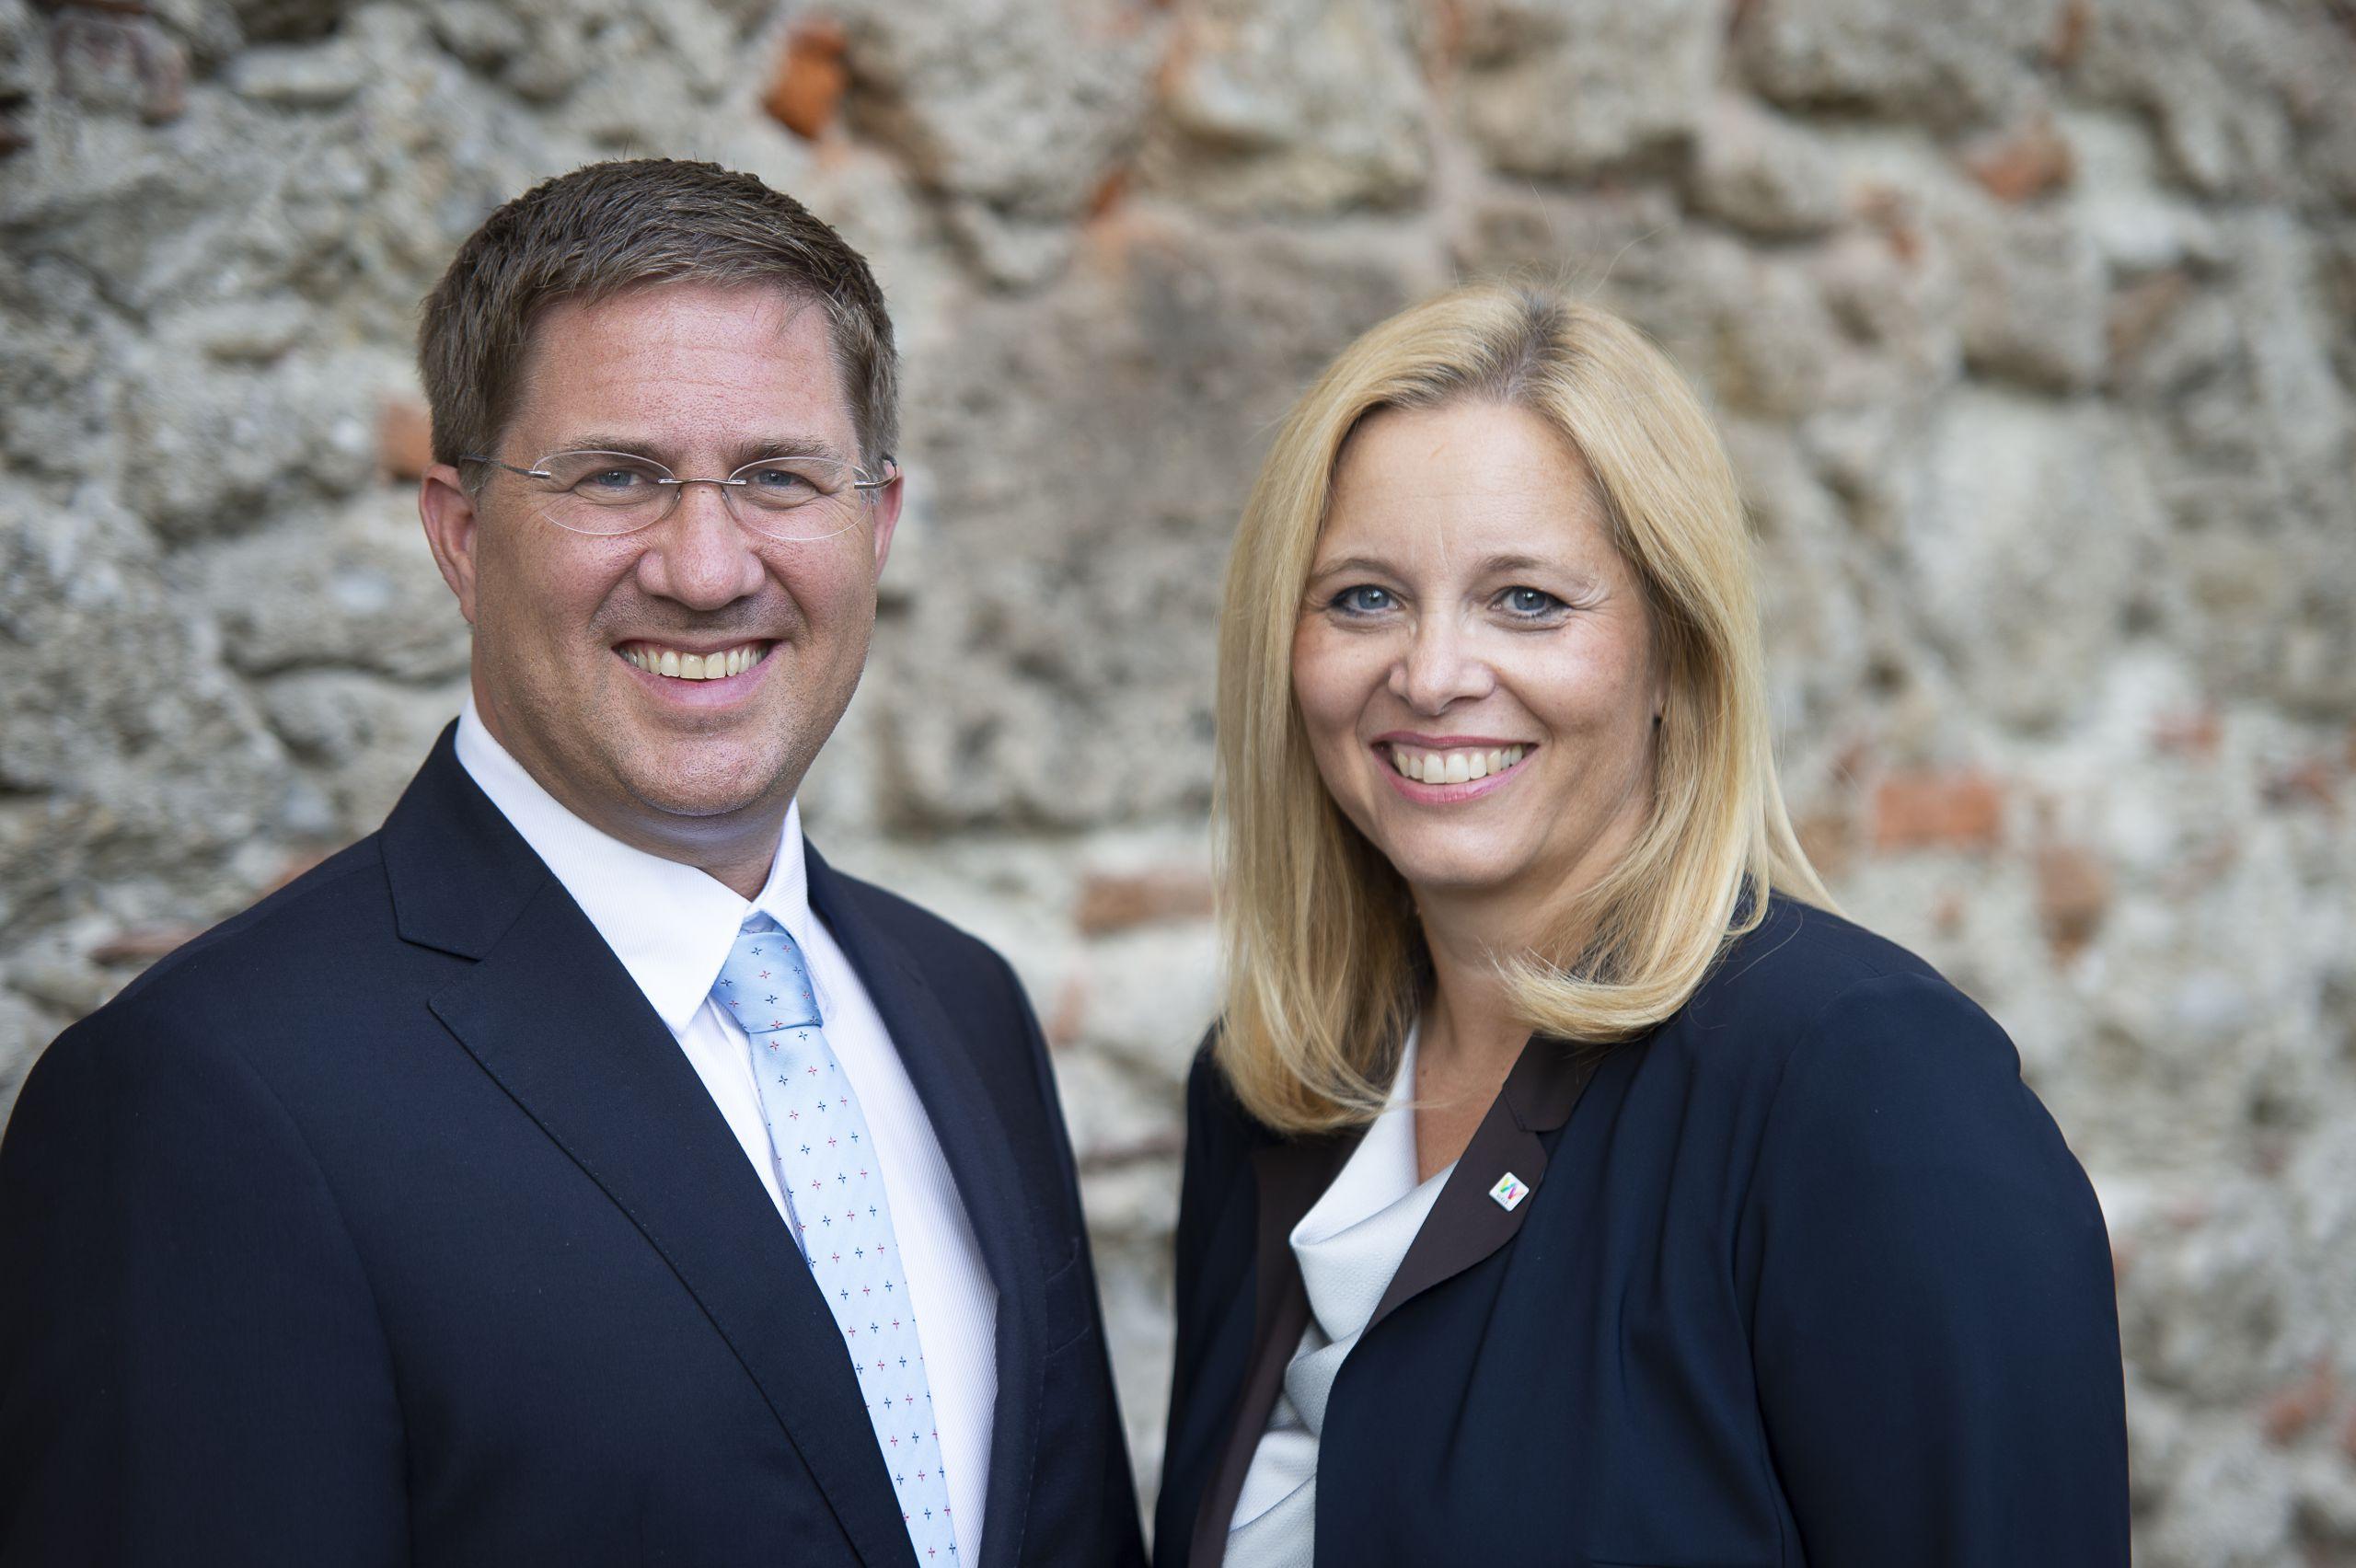 Bürgermeister Dr. Andreas Rabl und Vizebürgermeisterin Christa Raggl-Mühlberger